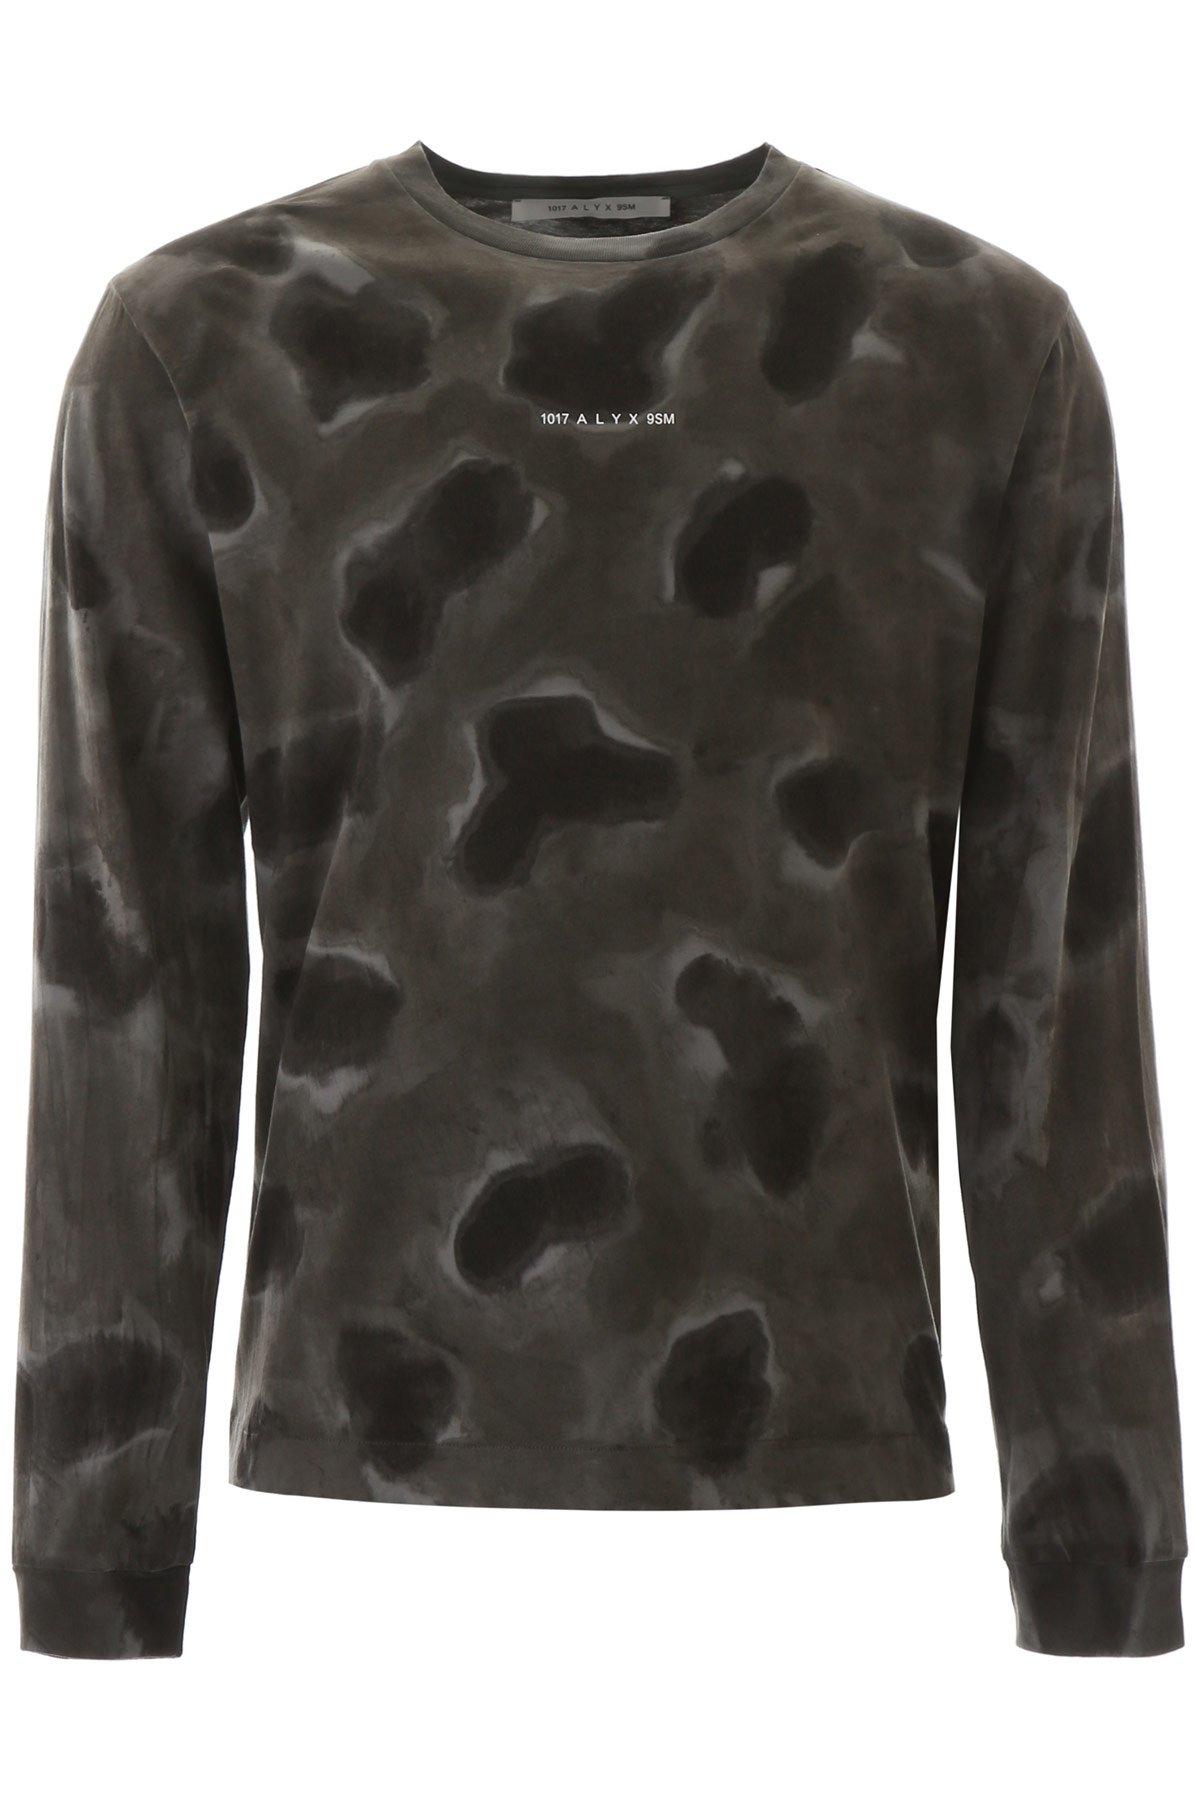 1017 alyx 9sm t-shirt logo camouflage